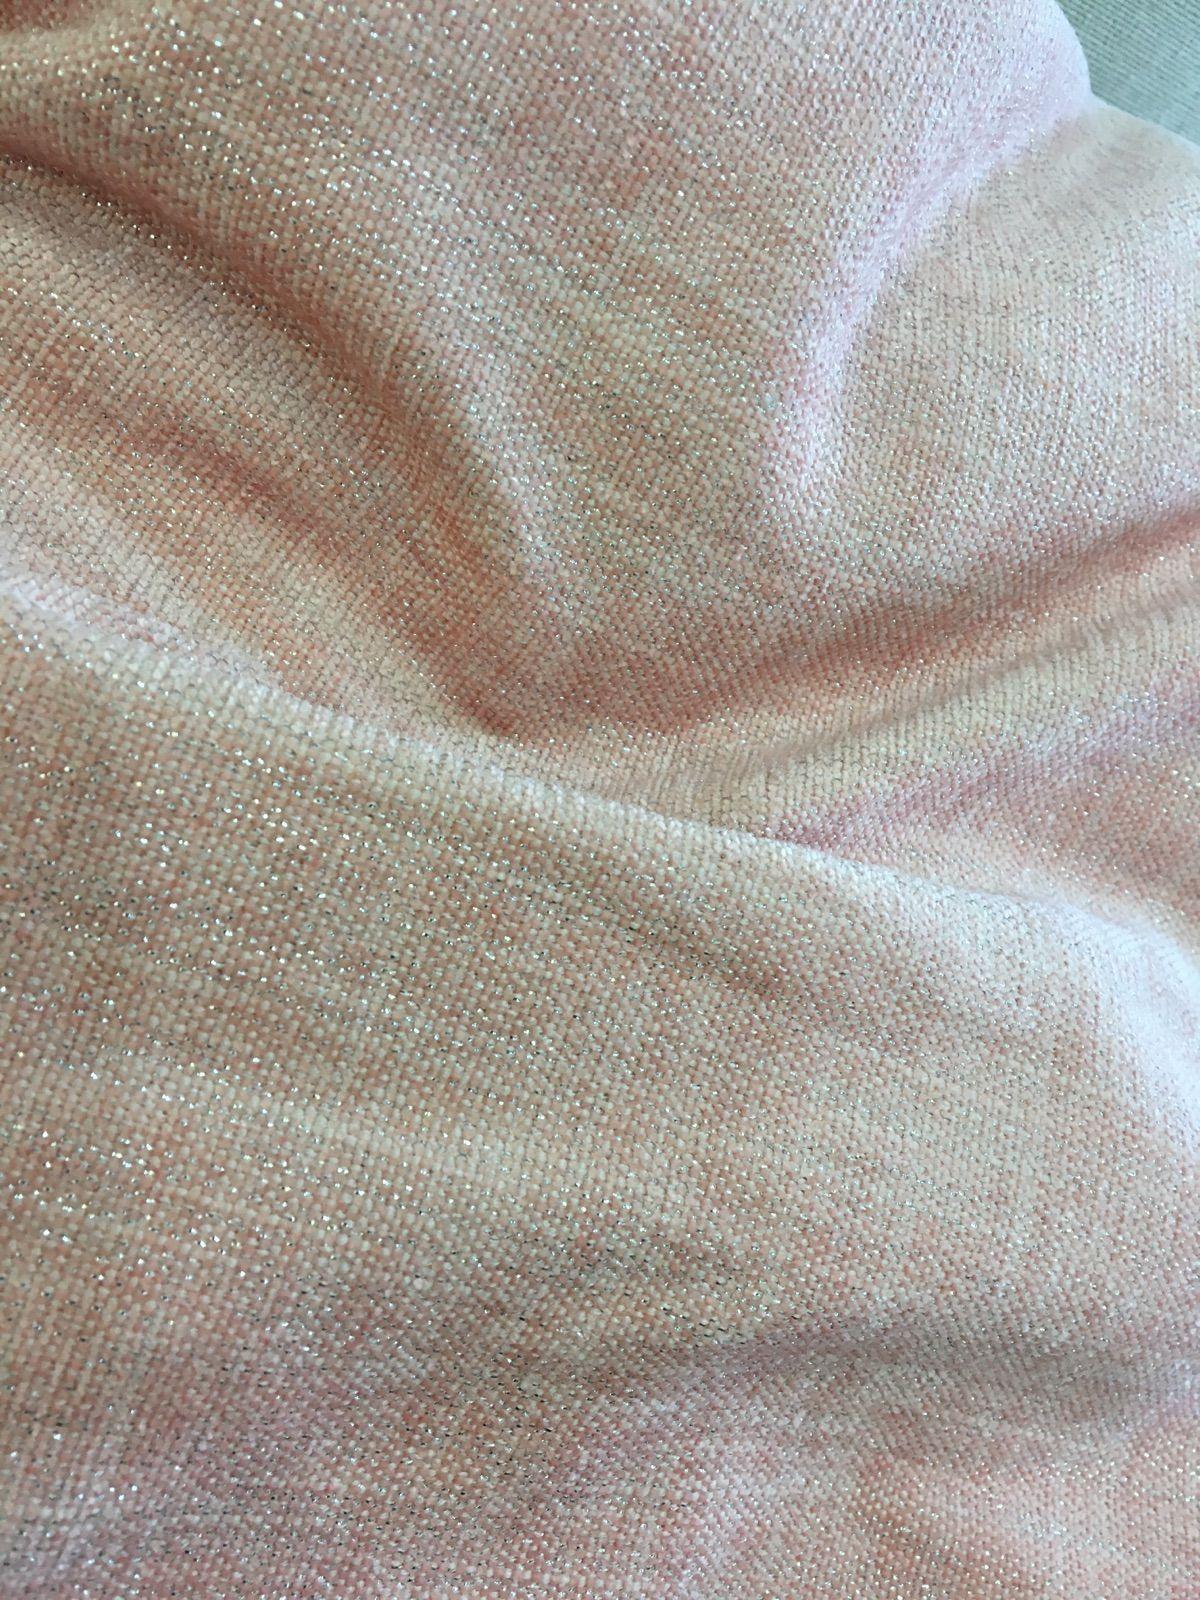 Blush Western Linen/Tablecloth Aztec Events u0026 Tents - Party u0026 Rental Company . & Blush Western Linen/Tablecloth Aztec Events u0026 Tents - Party ...